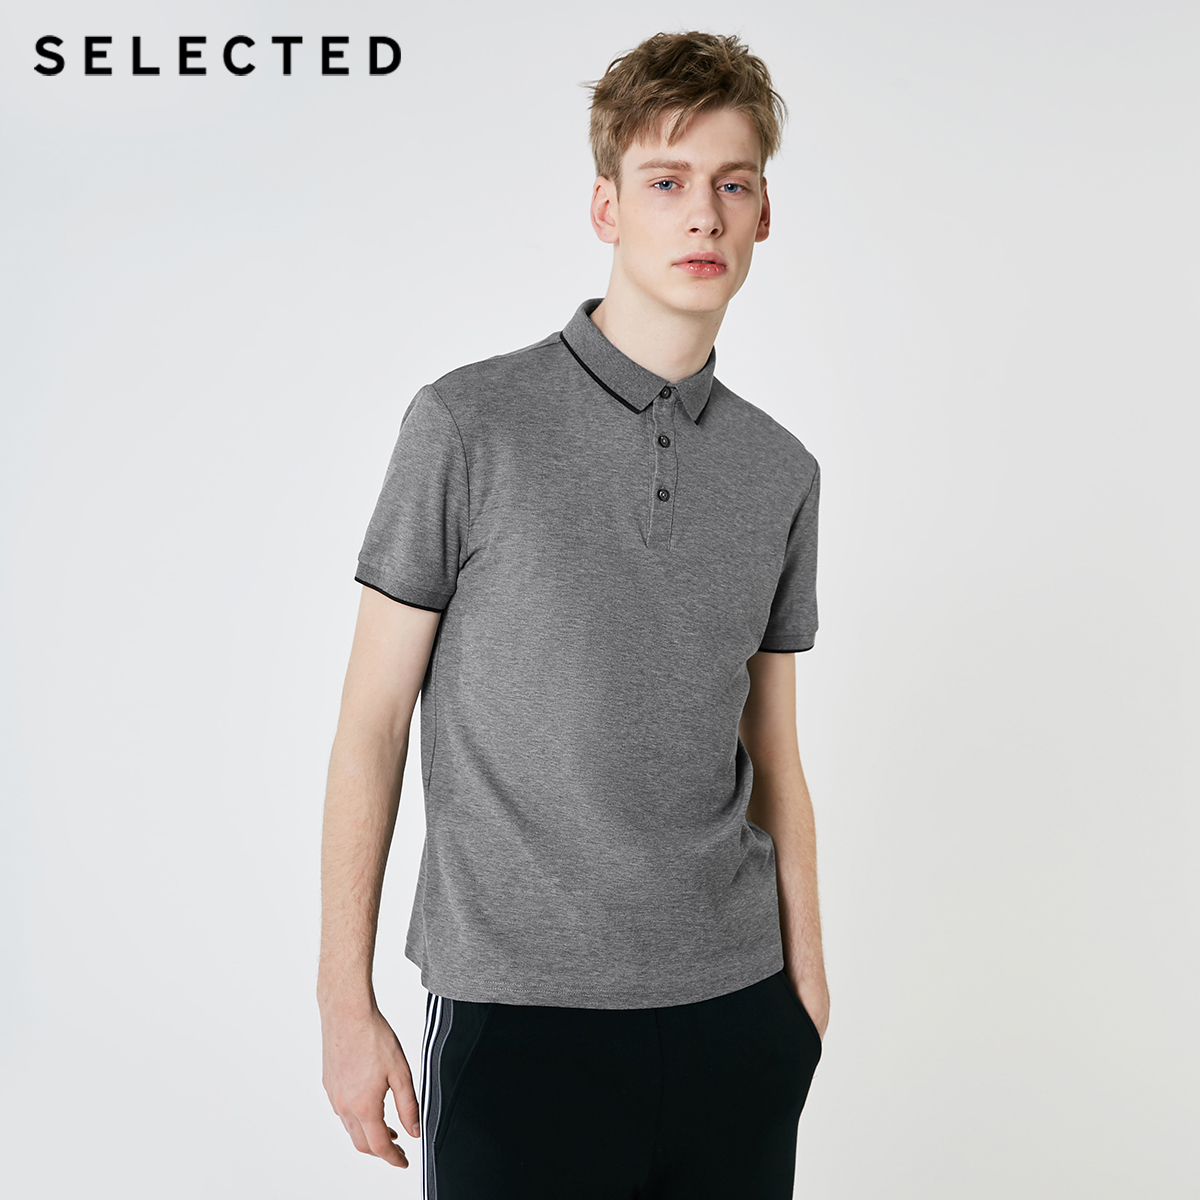 SELECTED Men's Summer Turn-down Collar Short-sleeved Polo S 419206503